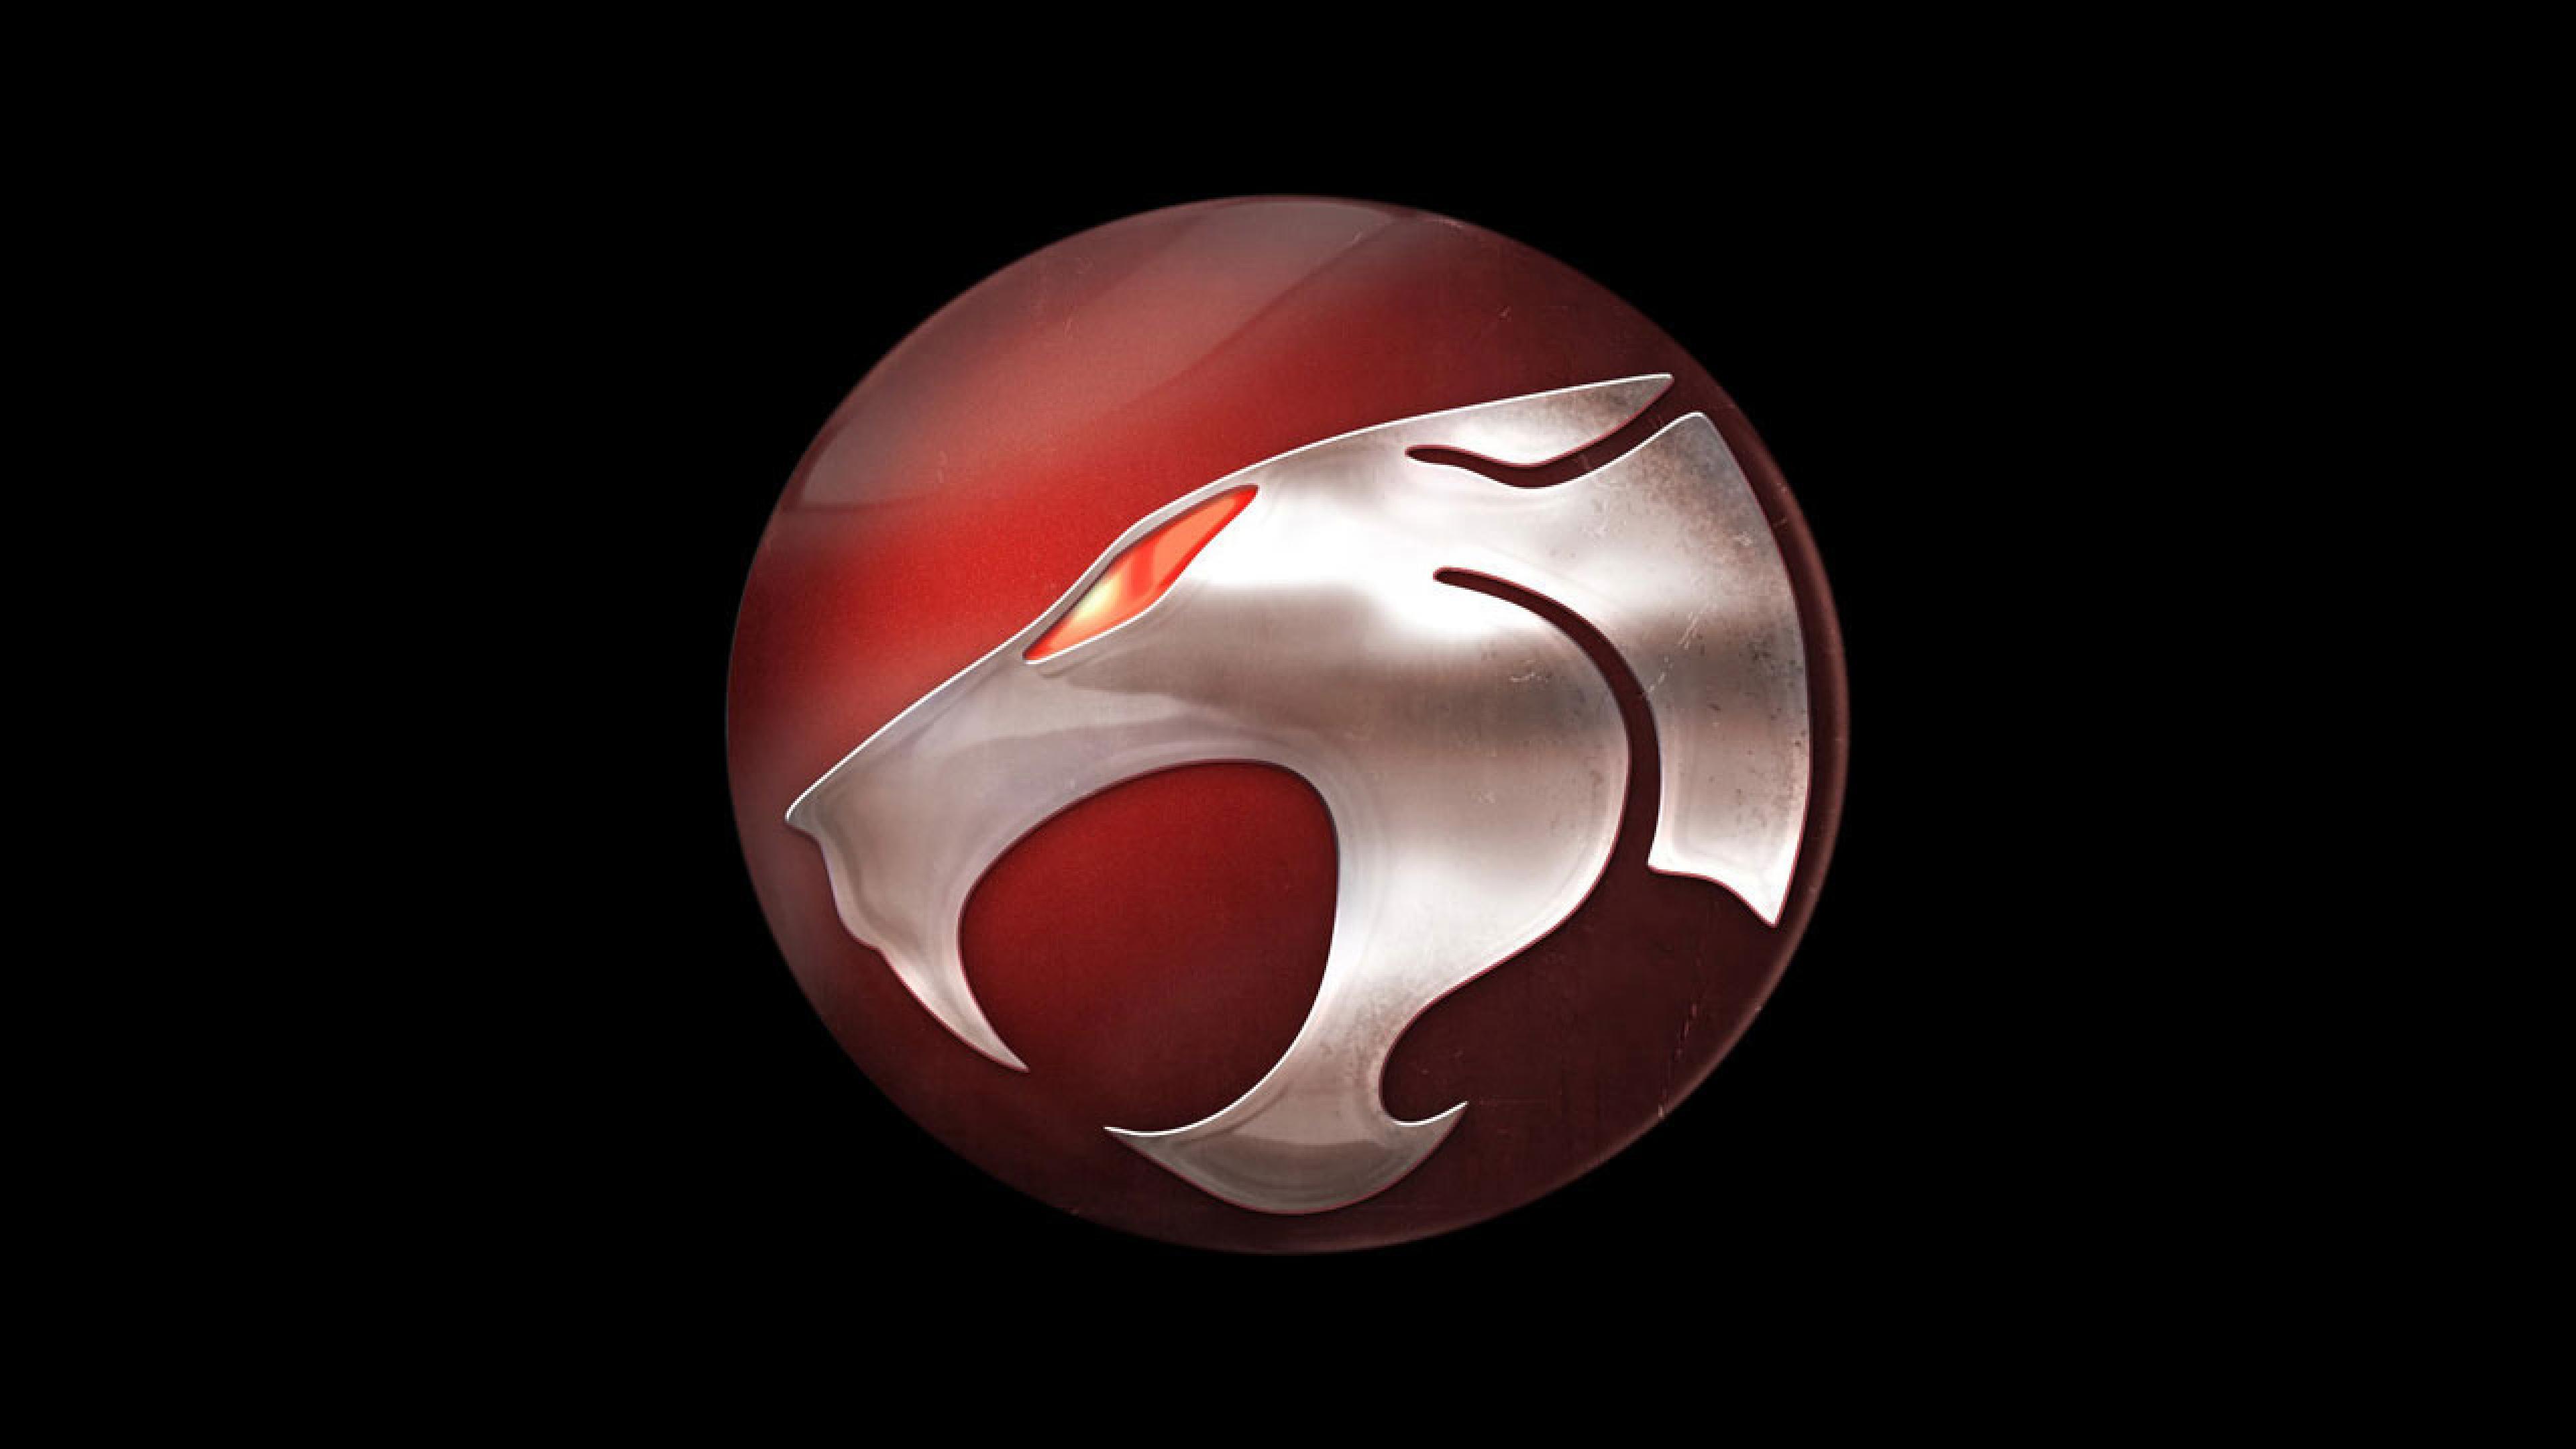 thundercats logo Ultra or Dual High Definition 2560x1440 3840x1080 3840x2160